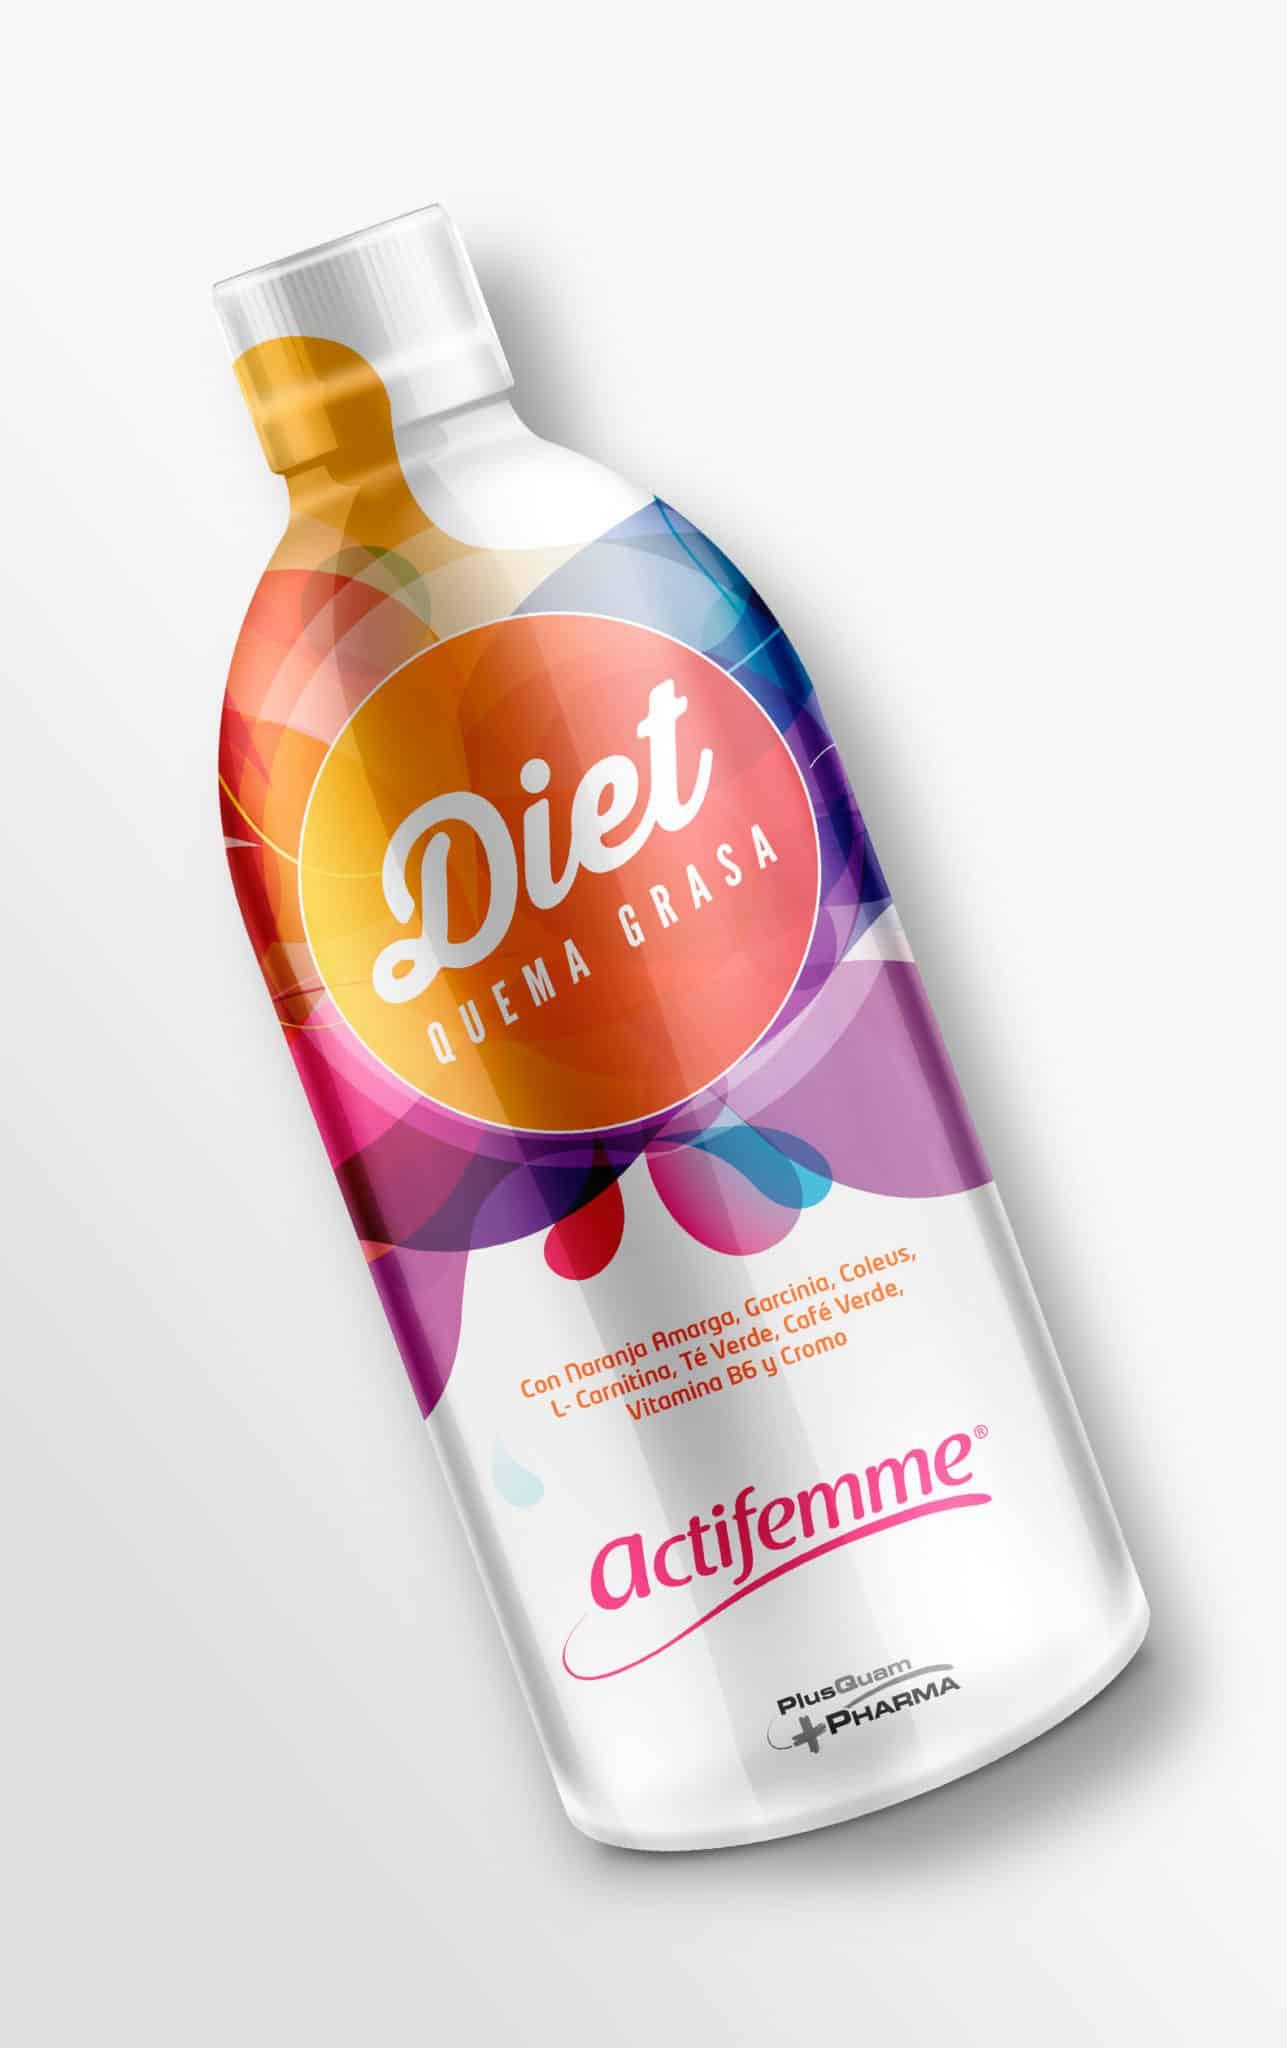 actifemme-quema-grasa-diet-adelgazar-rapido-dieta-detox-retencion-liquidos-perder-peso